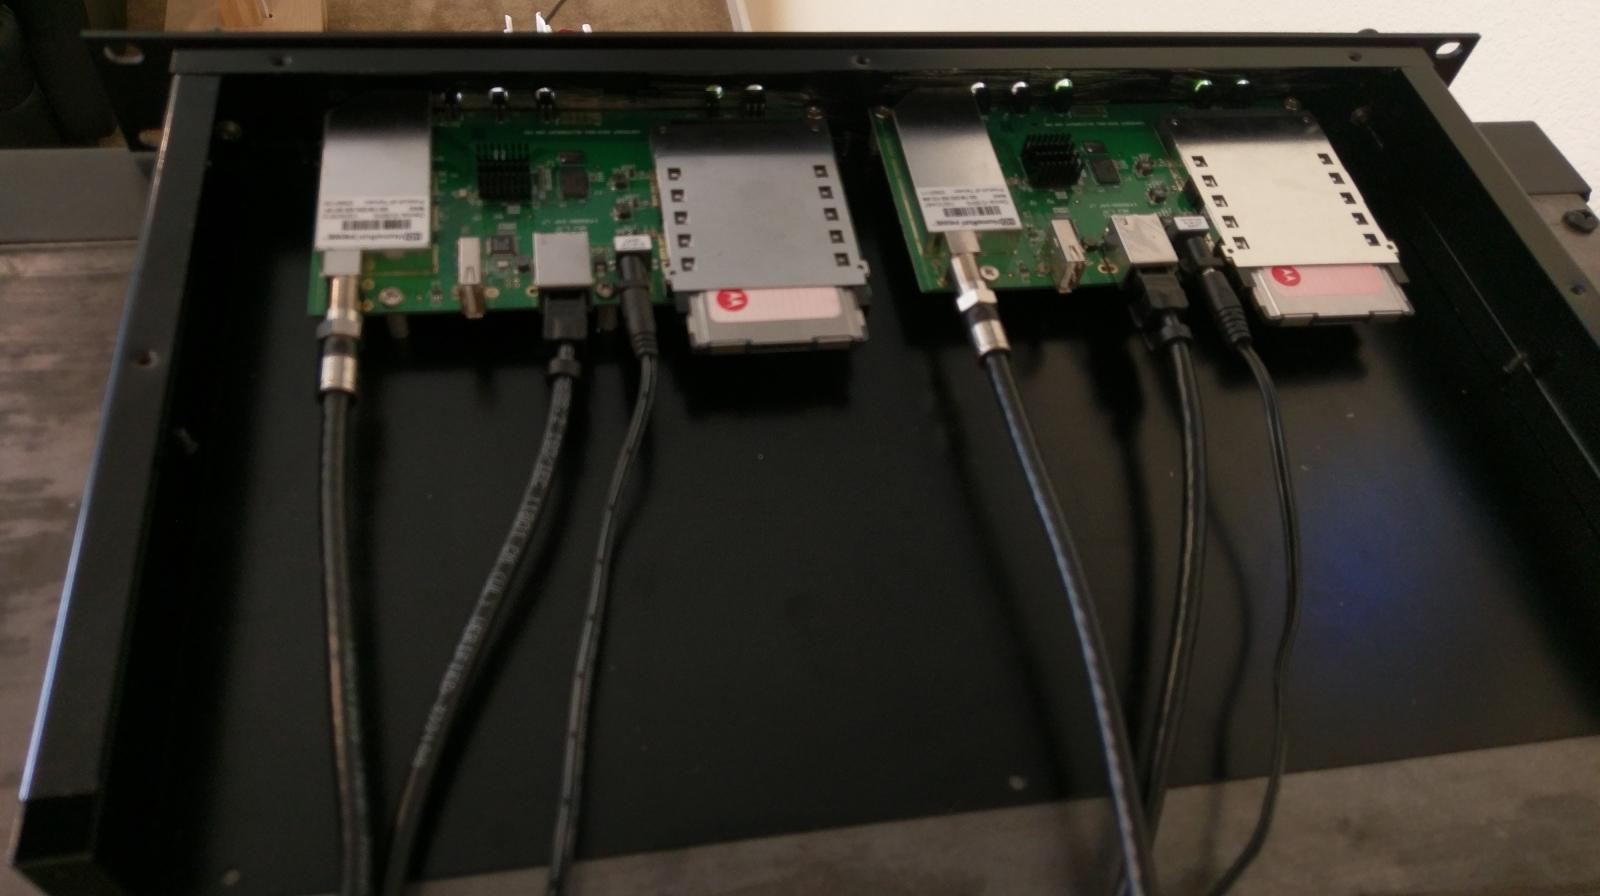 Two HDHR Primes in a 1U rack mount enclosure - Hardware